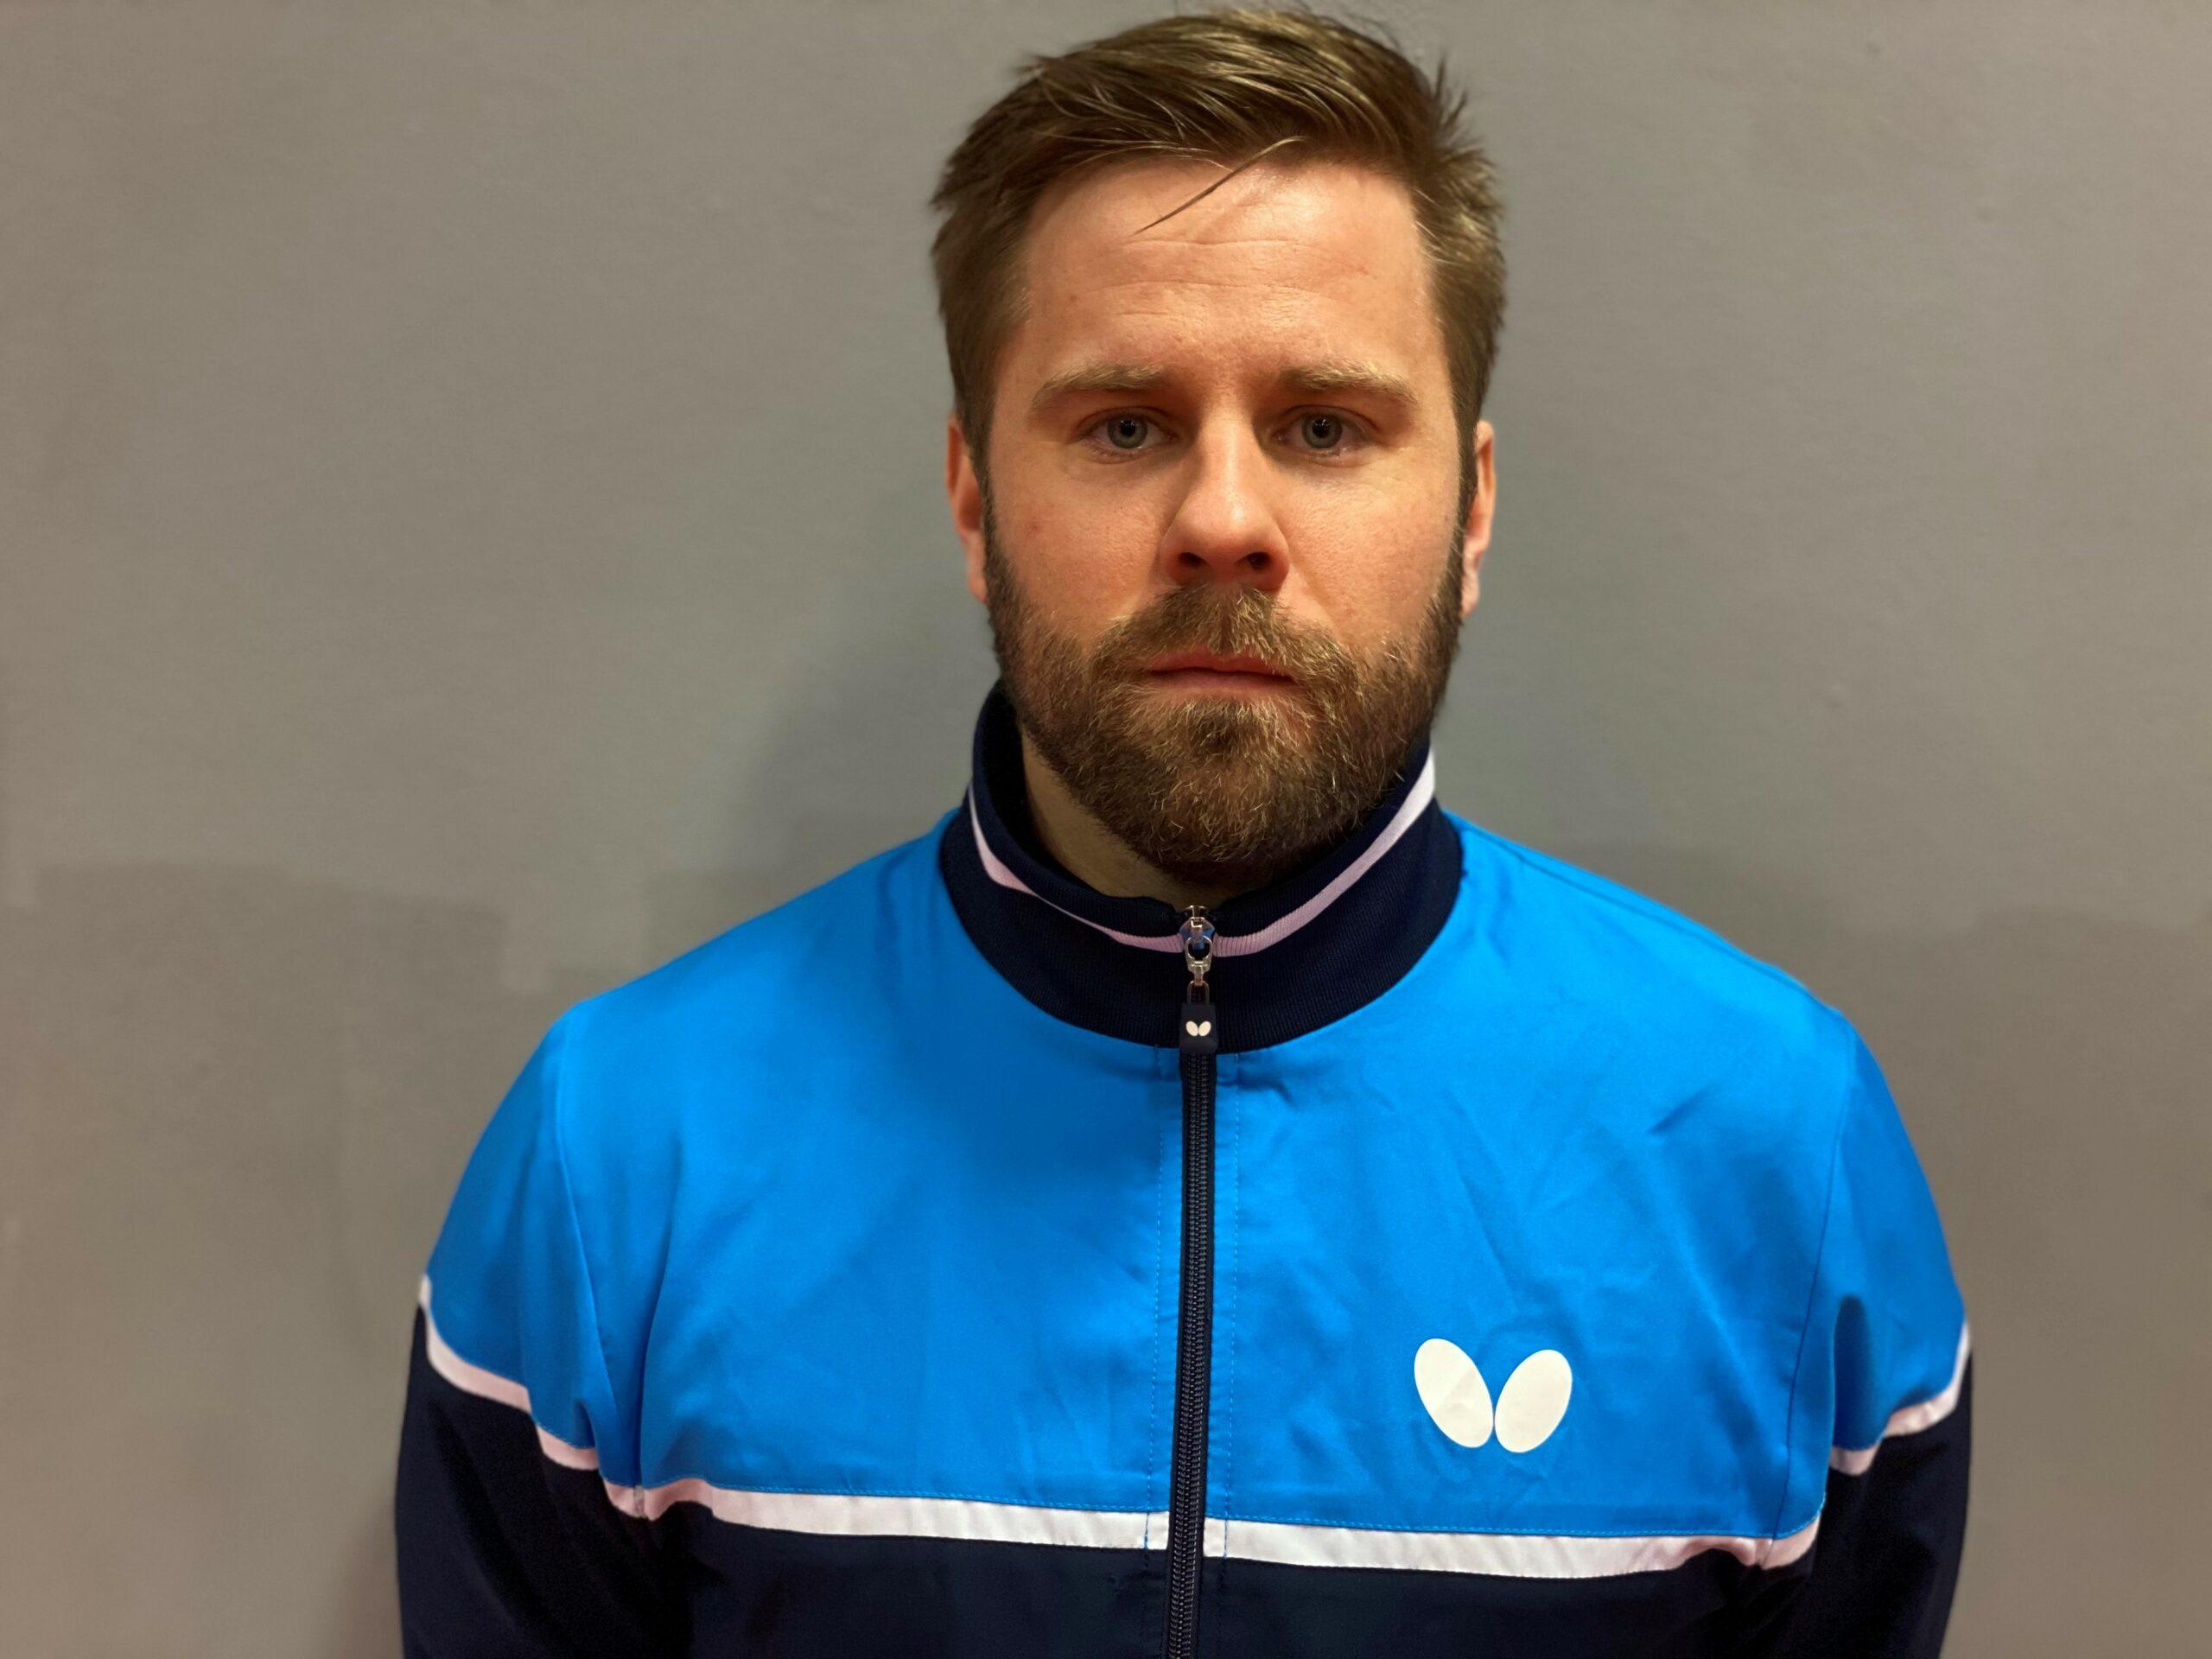 Jon Persson